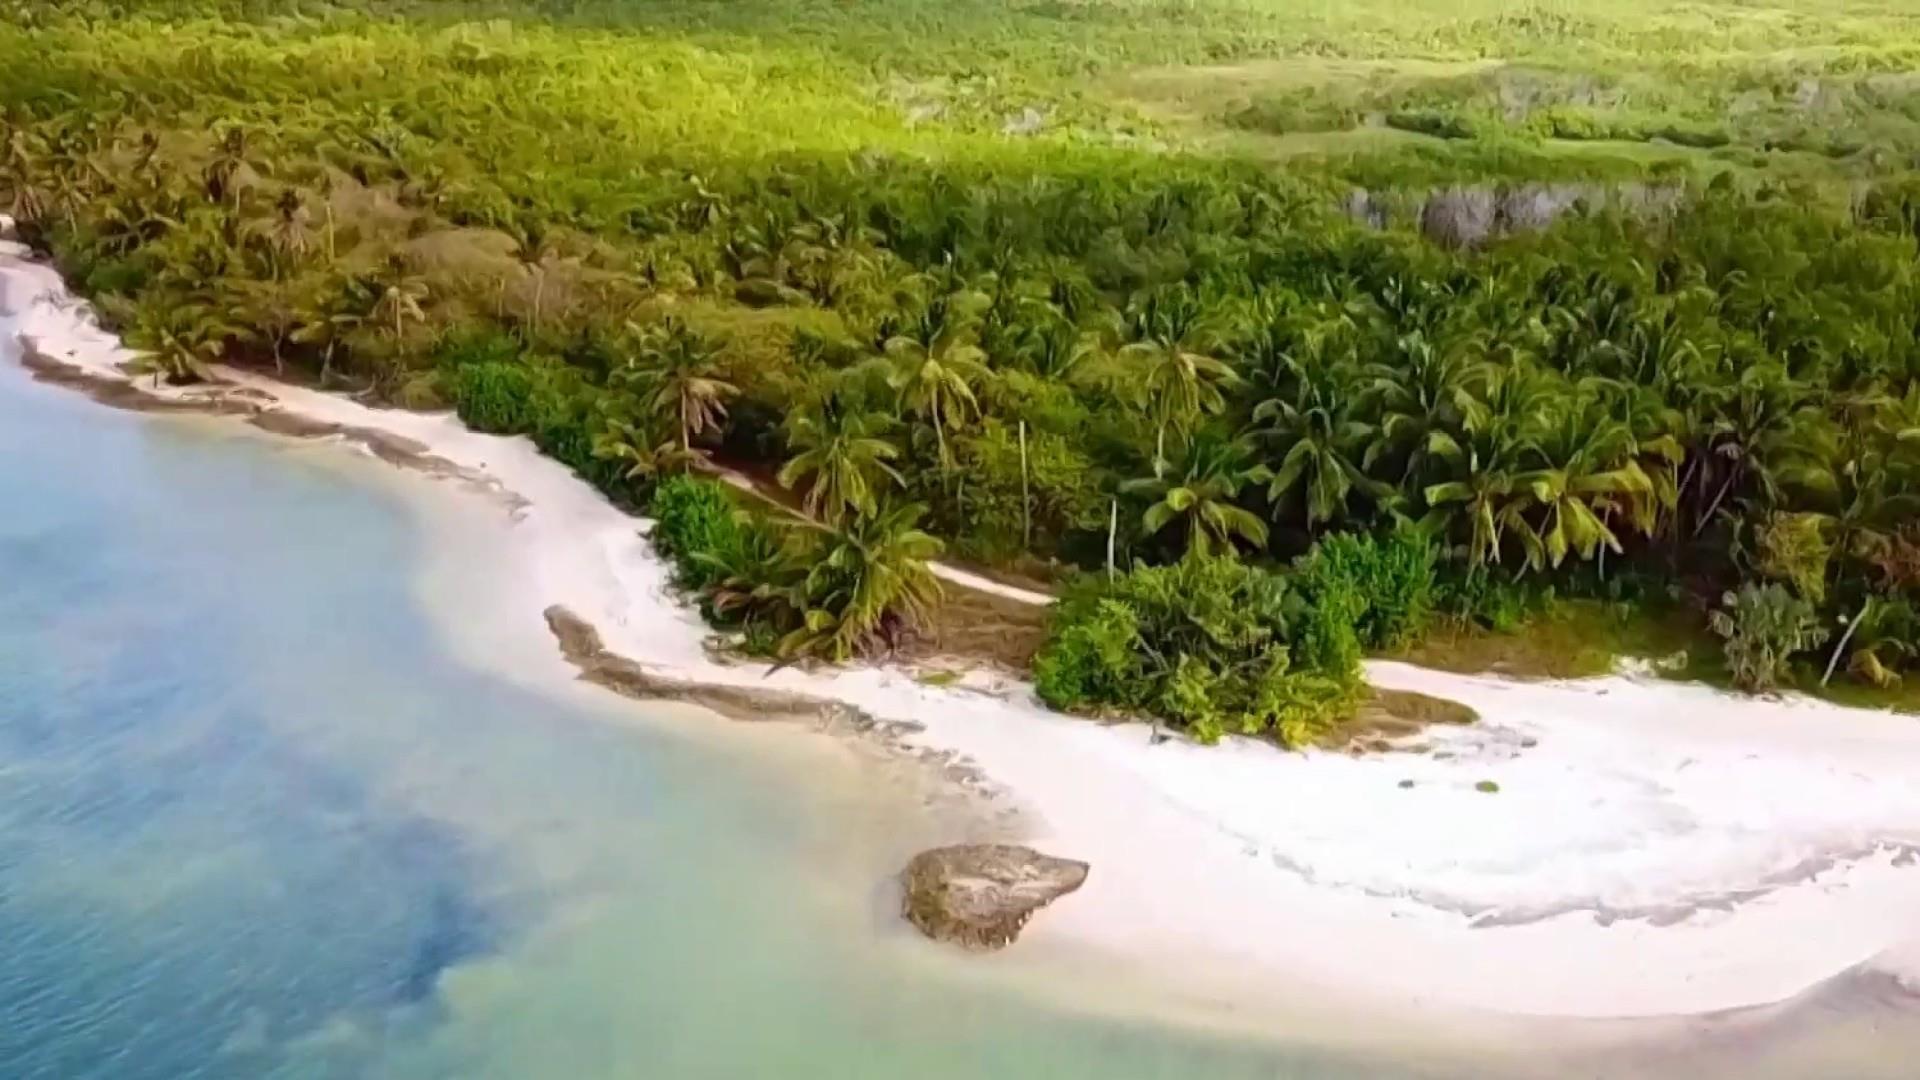 Dominican Republic Resorts >> Fbi Investigating 3 Deaths At Same Dominican Republic Resort More